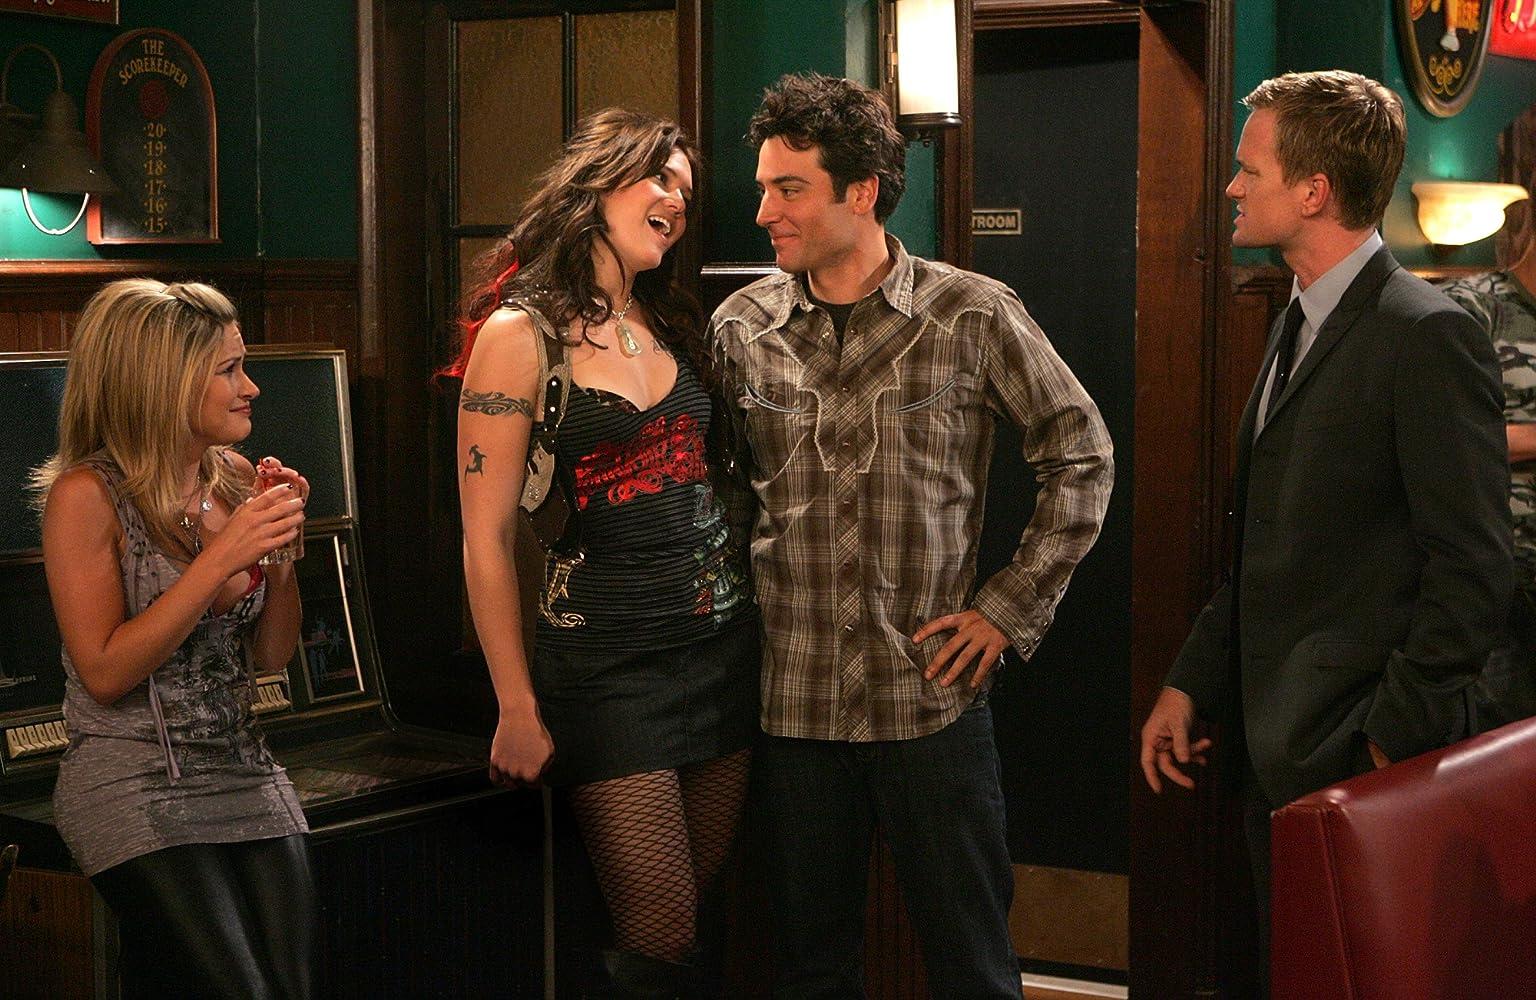 Neil Patrick Harris, Mandy Moore, Josh Radnor, and Amanda Loncar in How I Met Your Mother (2005)